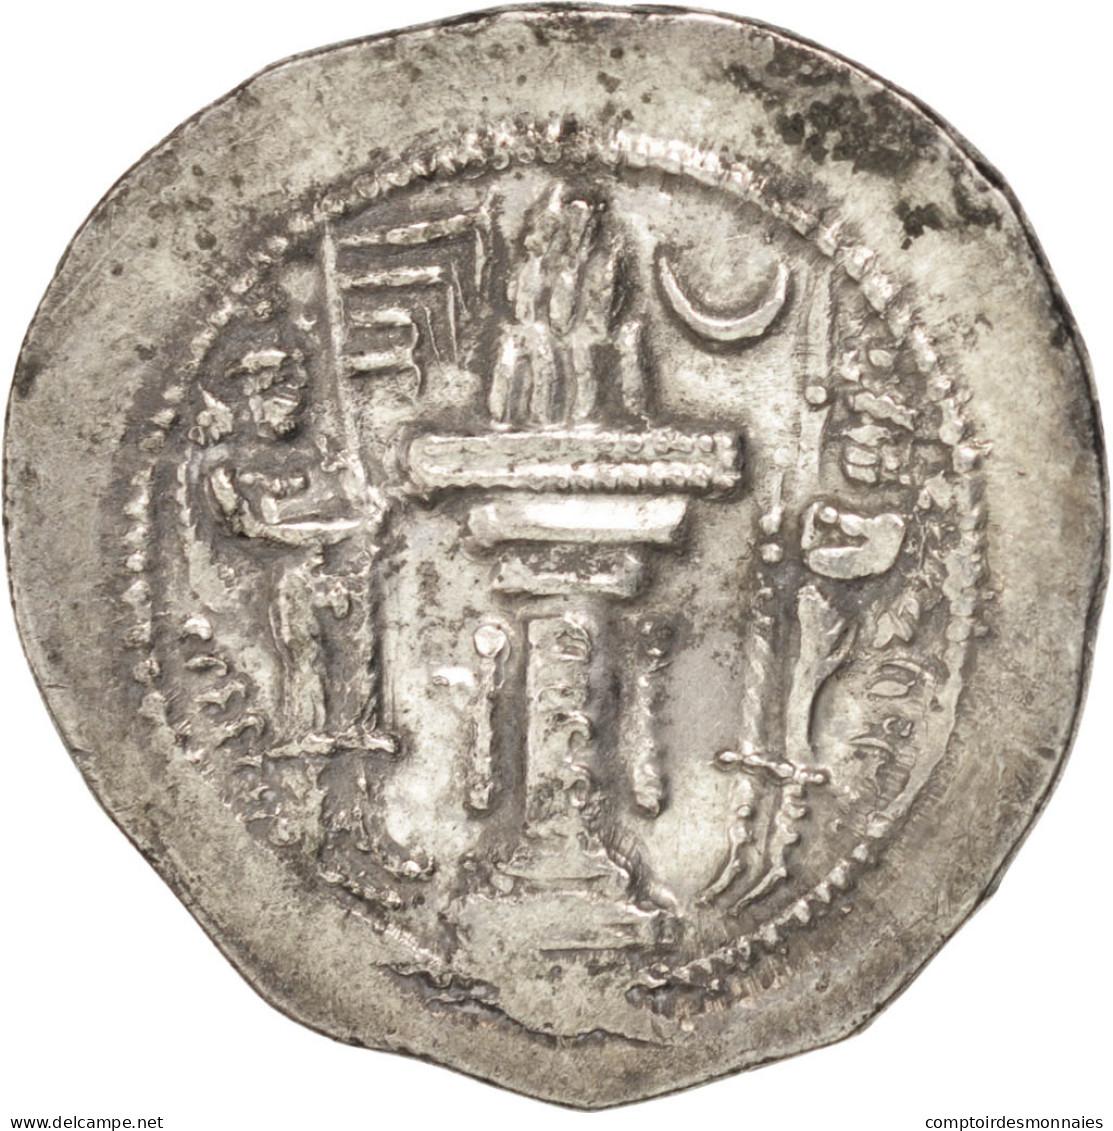 Sassanides, Yazdgard Ier (390-420), Drachme, Göbl 149 Var. - Orientales